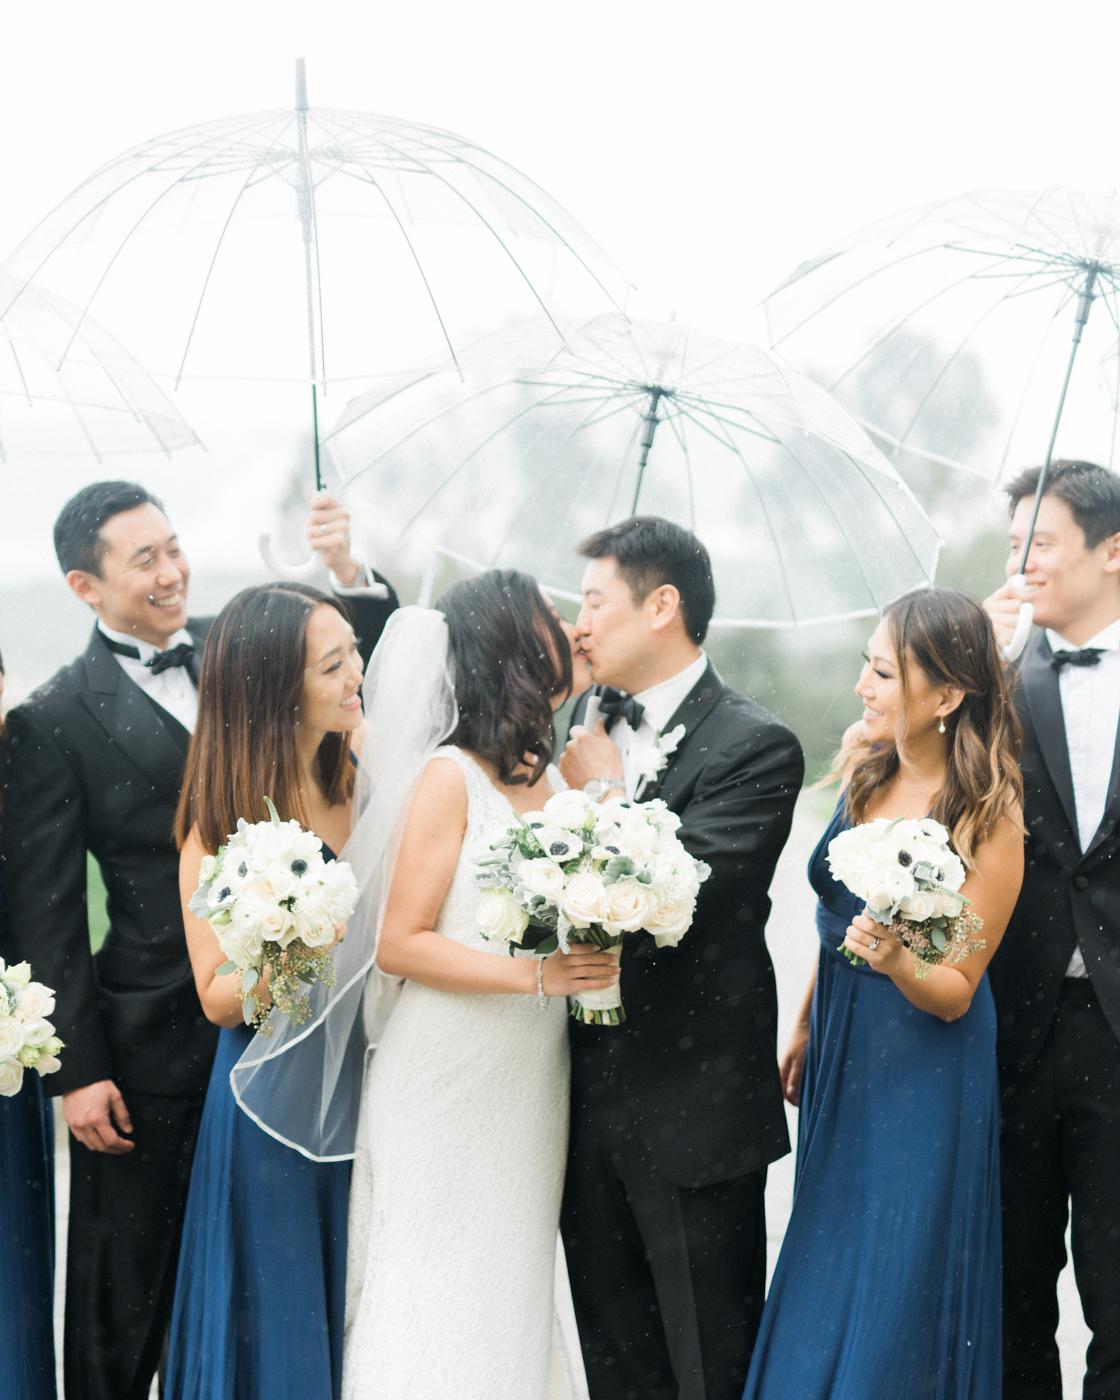 Friendly_Hills_Country_Club_fine_art_wedding_photographer_los_angeles_paris-14.jpg